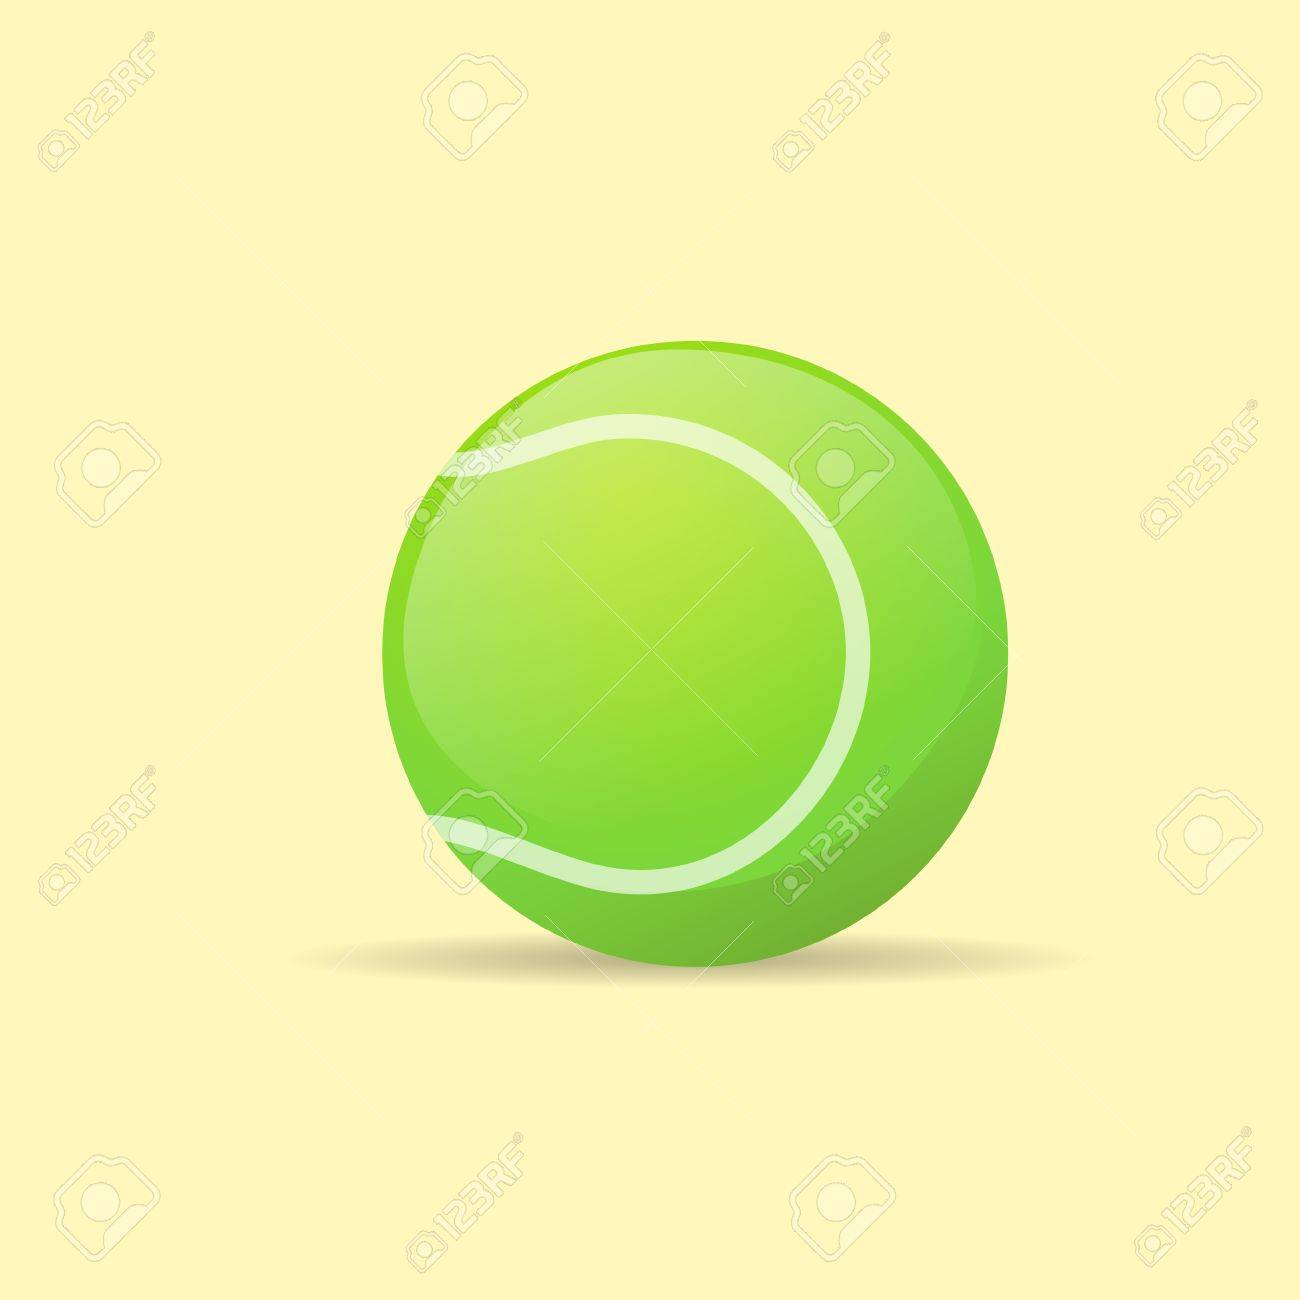 Tennis Ball Color Flat Icon Vector Royalty Free Cliparts Vectors